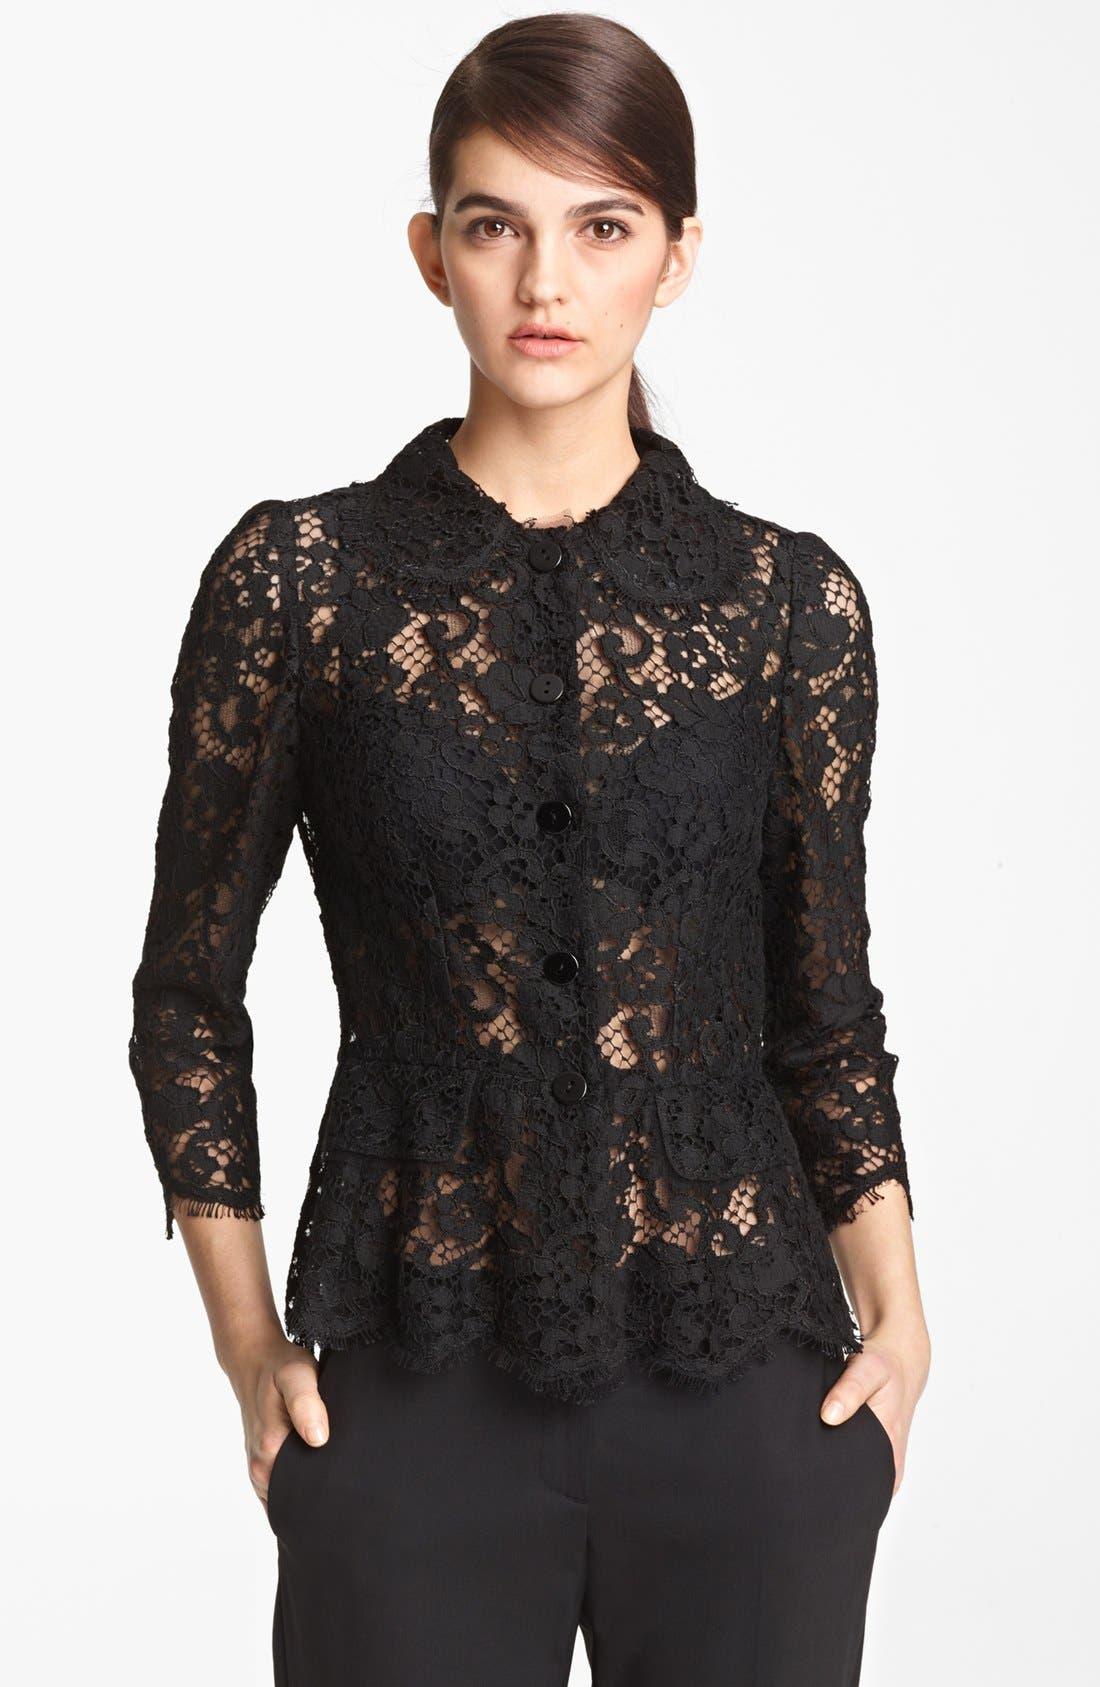 Main Image - Dolce&Gabbana Sheer Lace Jacket